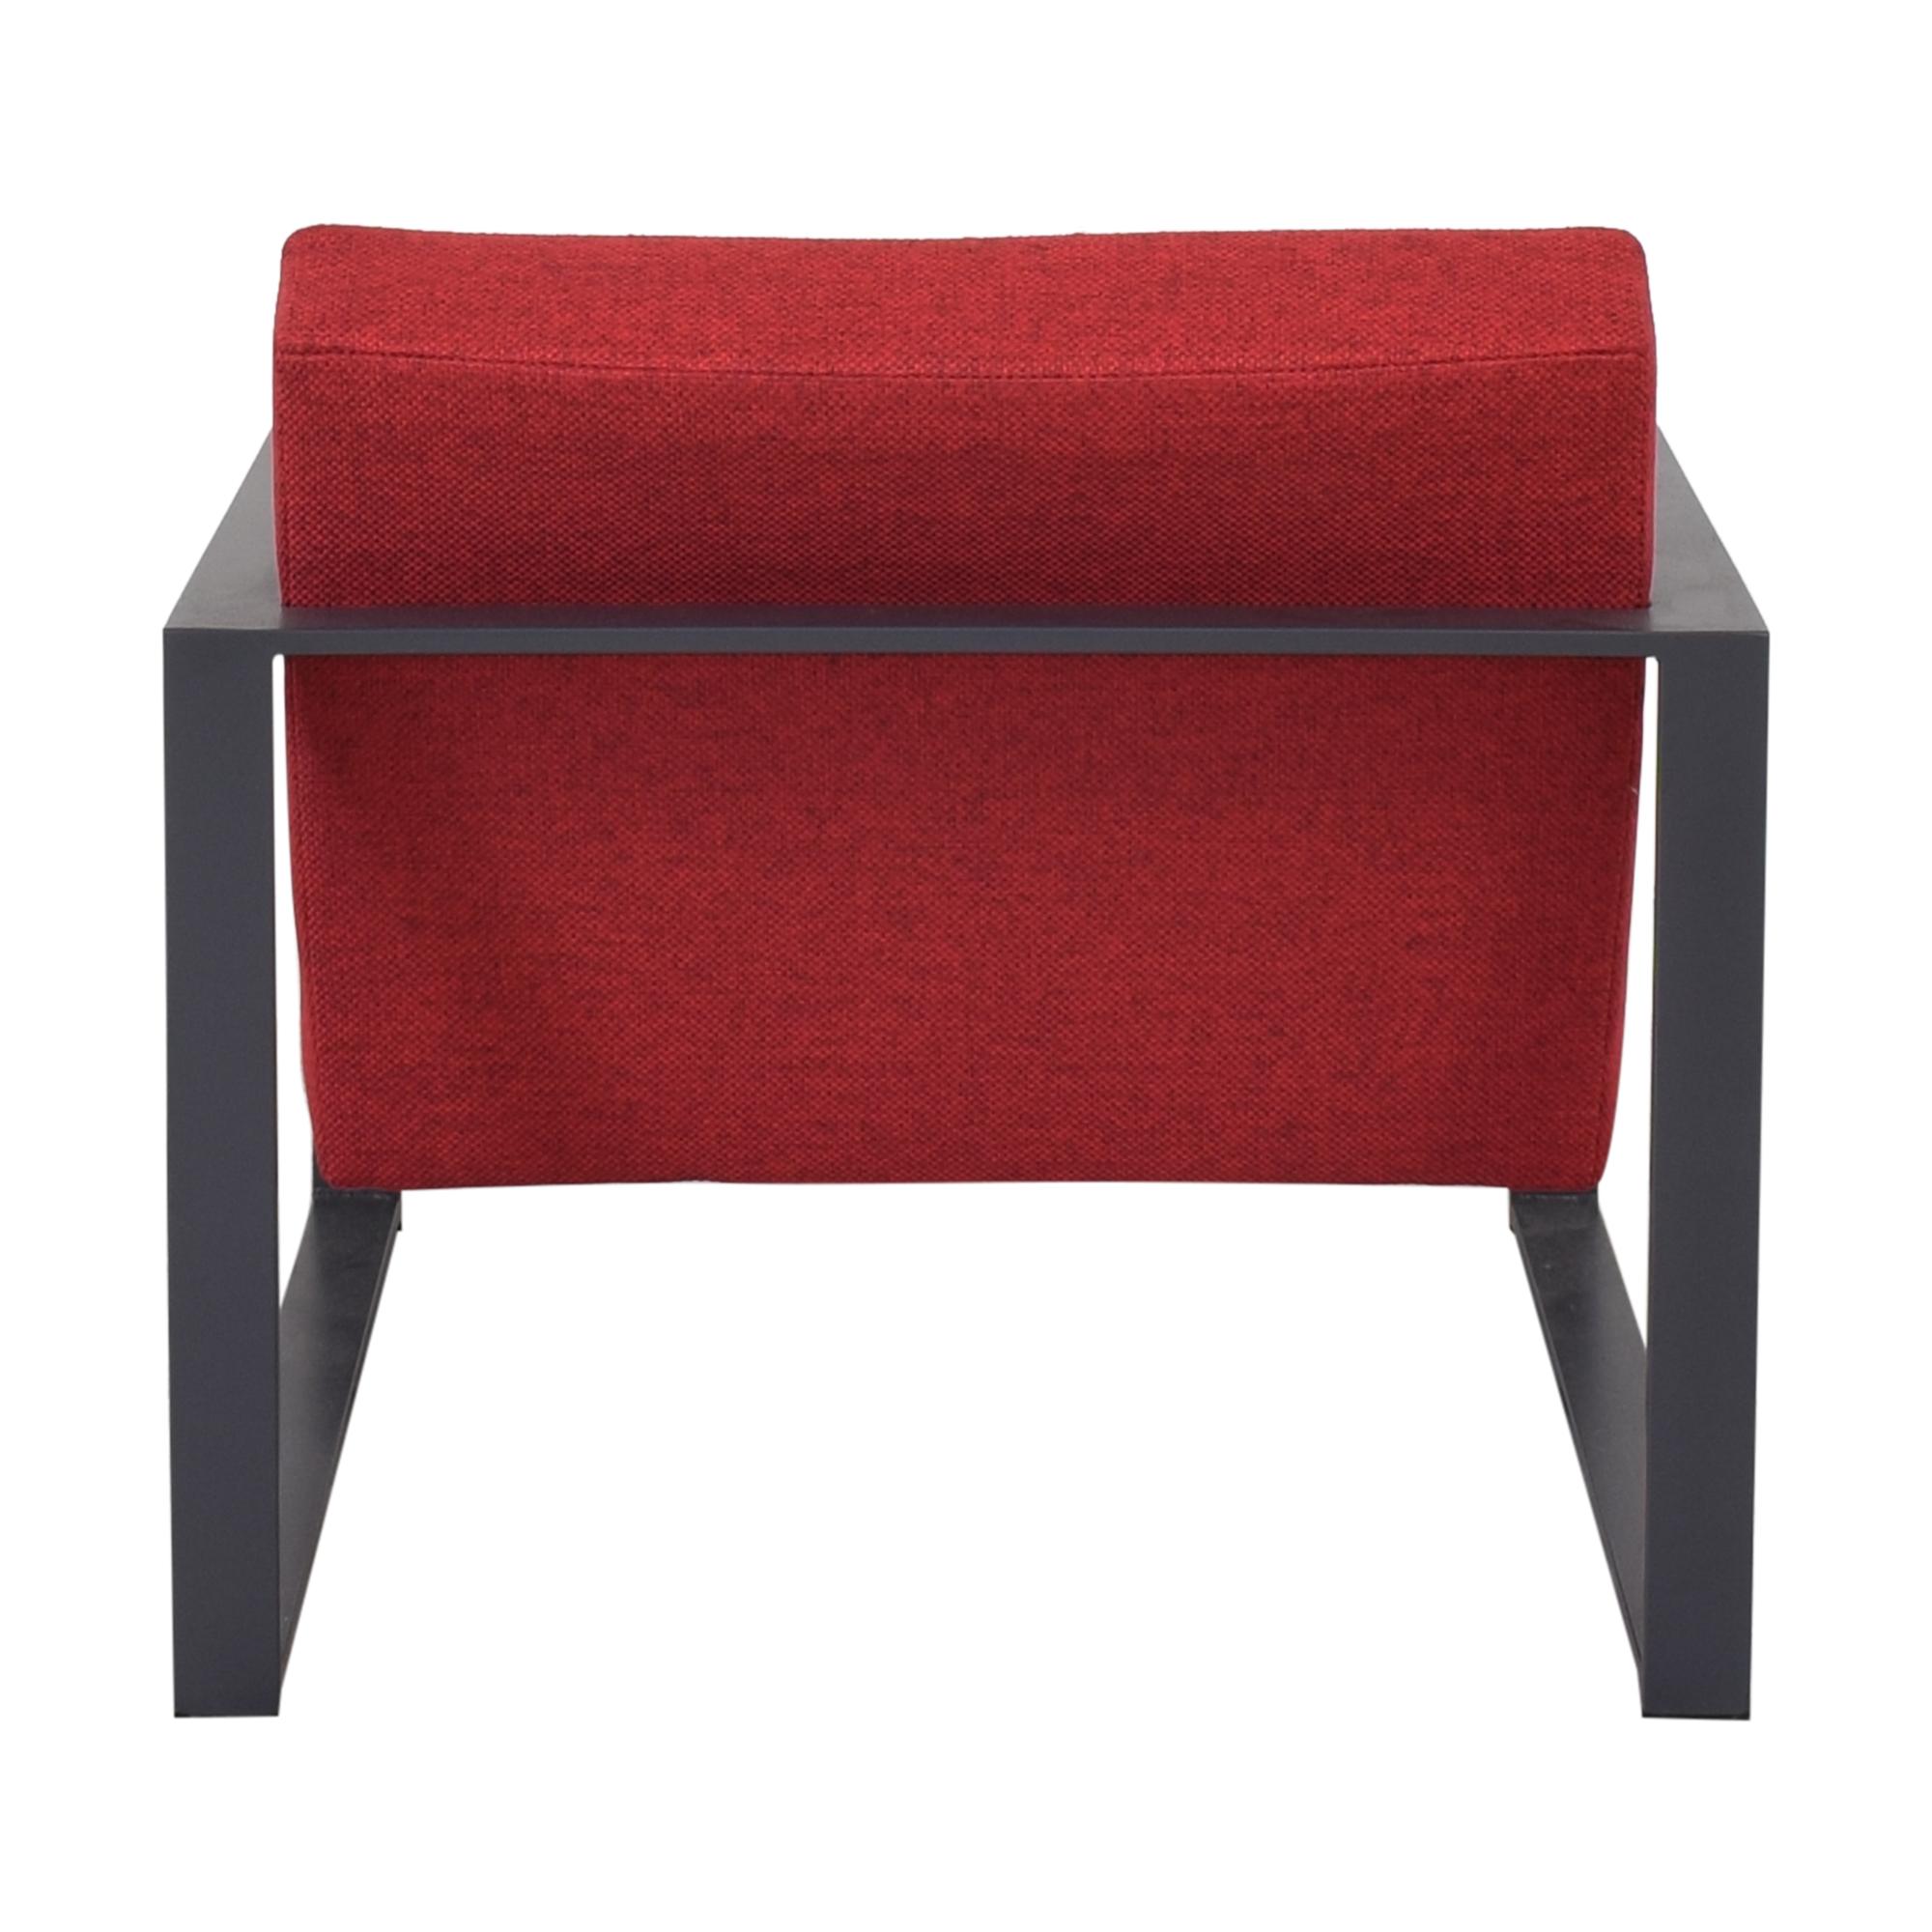 Crate & Barrel Crate & Barrel Specs Chair Chairs